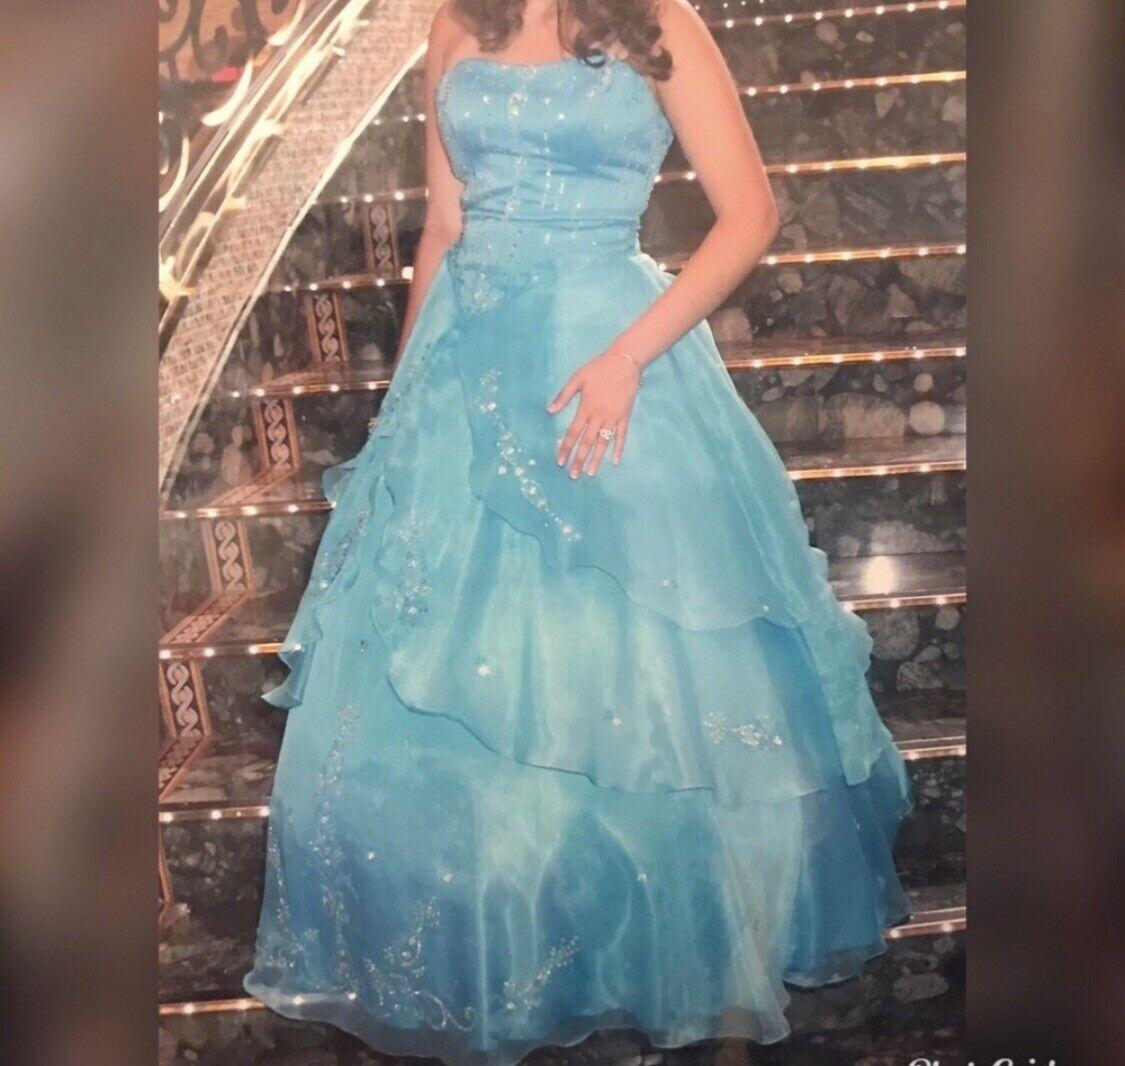 blue ball gown dress - image 6